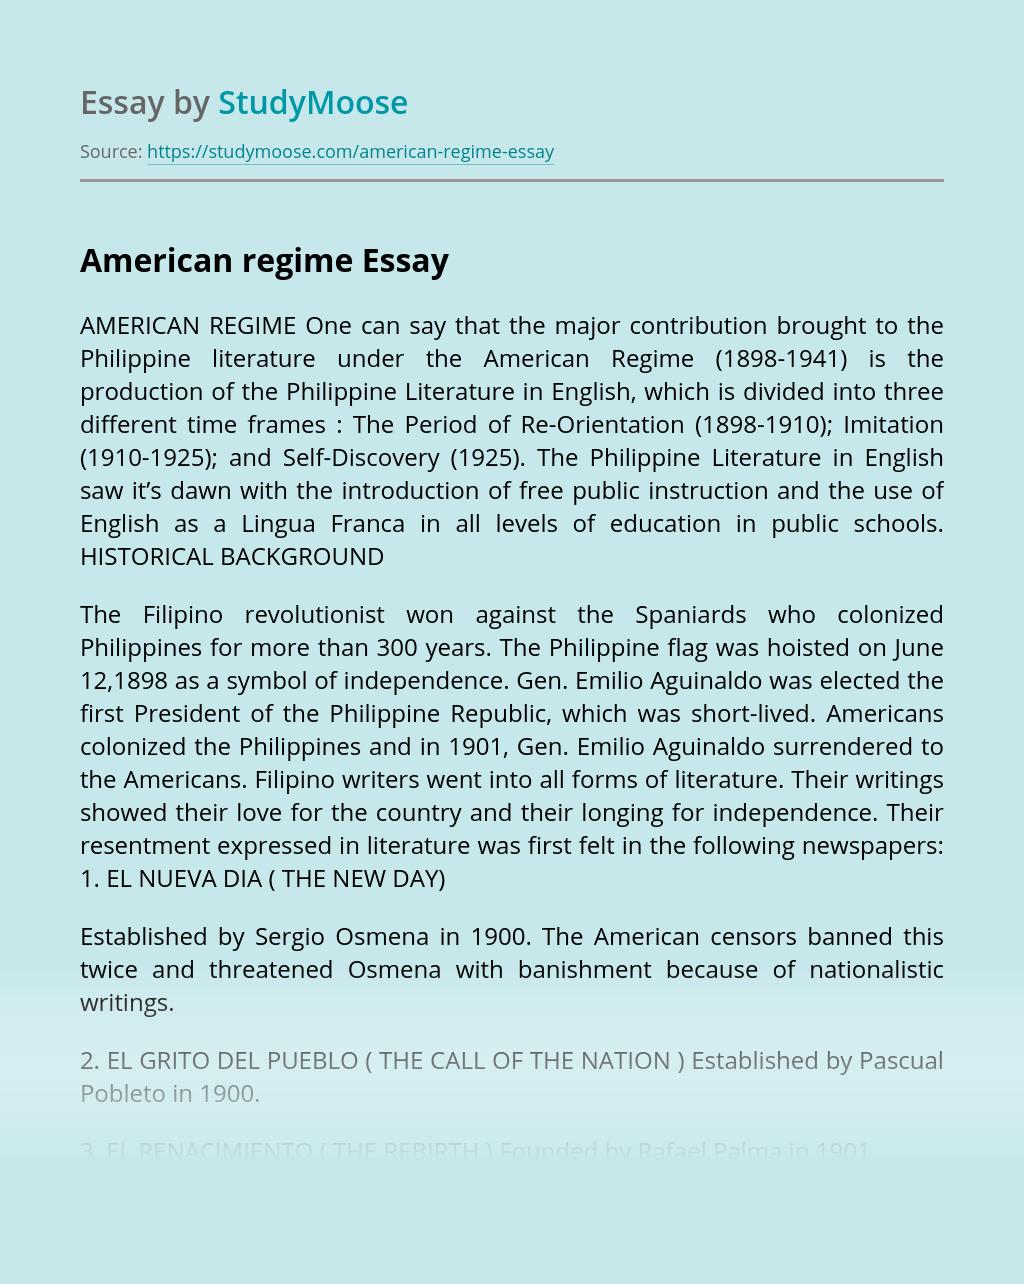 American regime